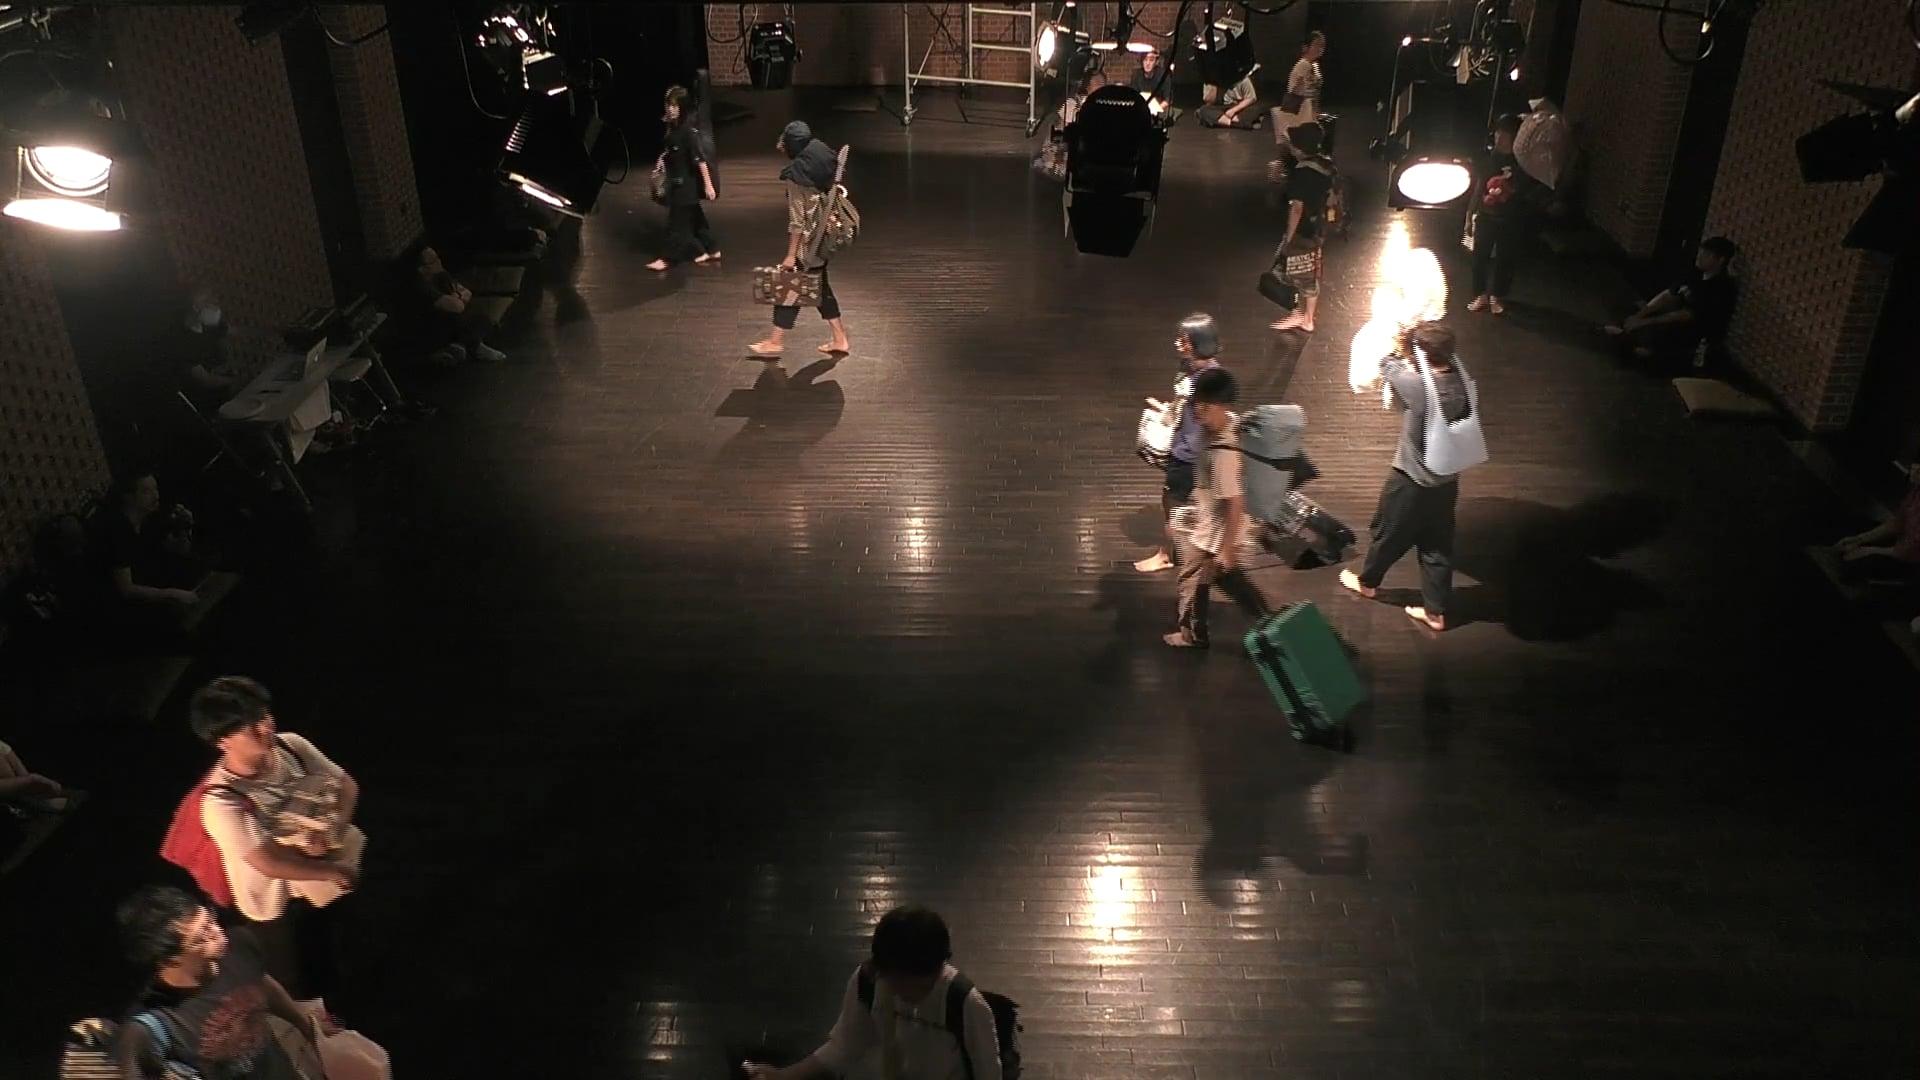 Heini Nukari x Marcelo Evelin × Shikoku Gakuin University  SHOWING